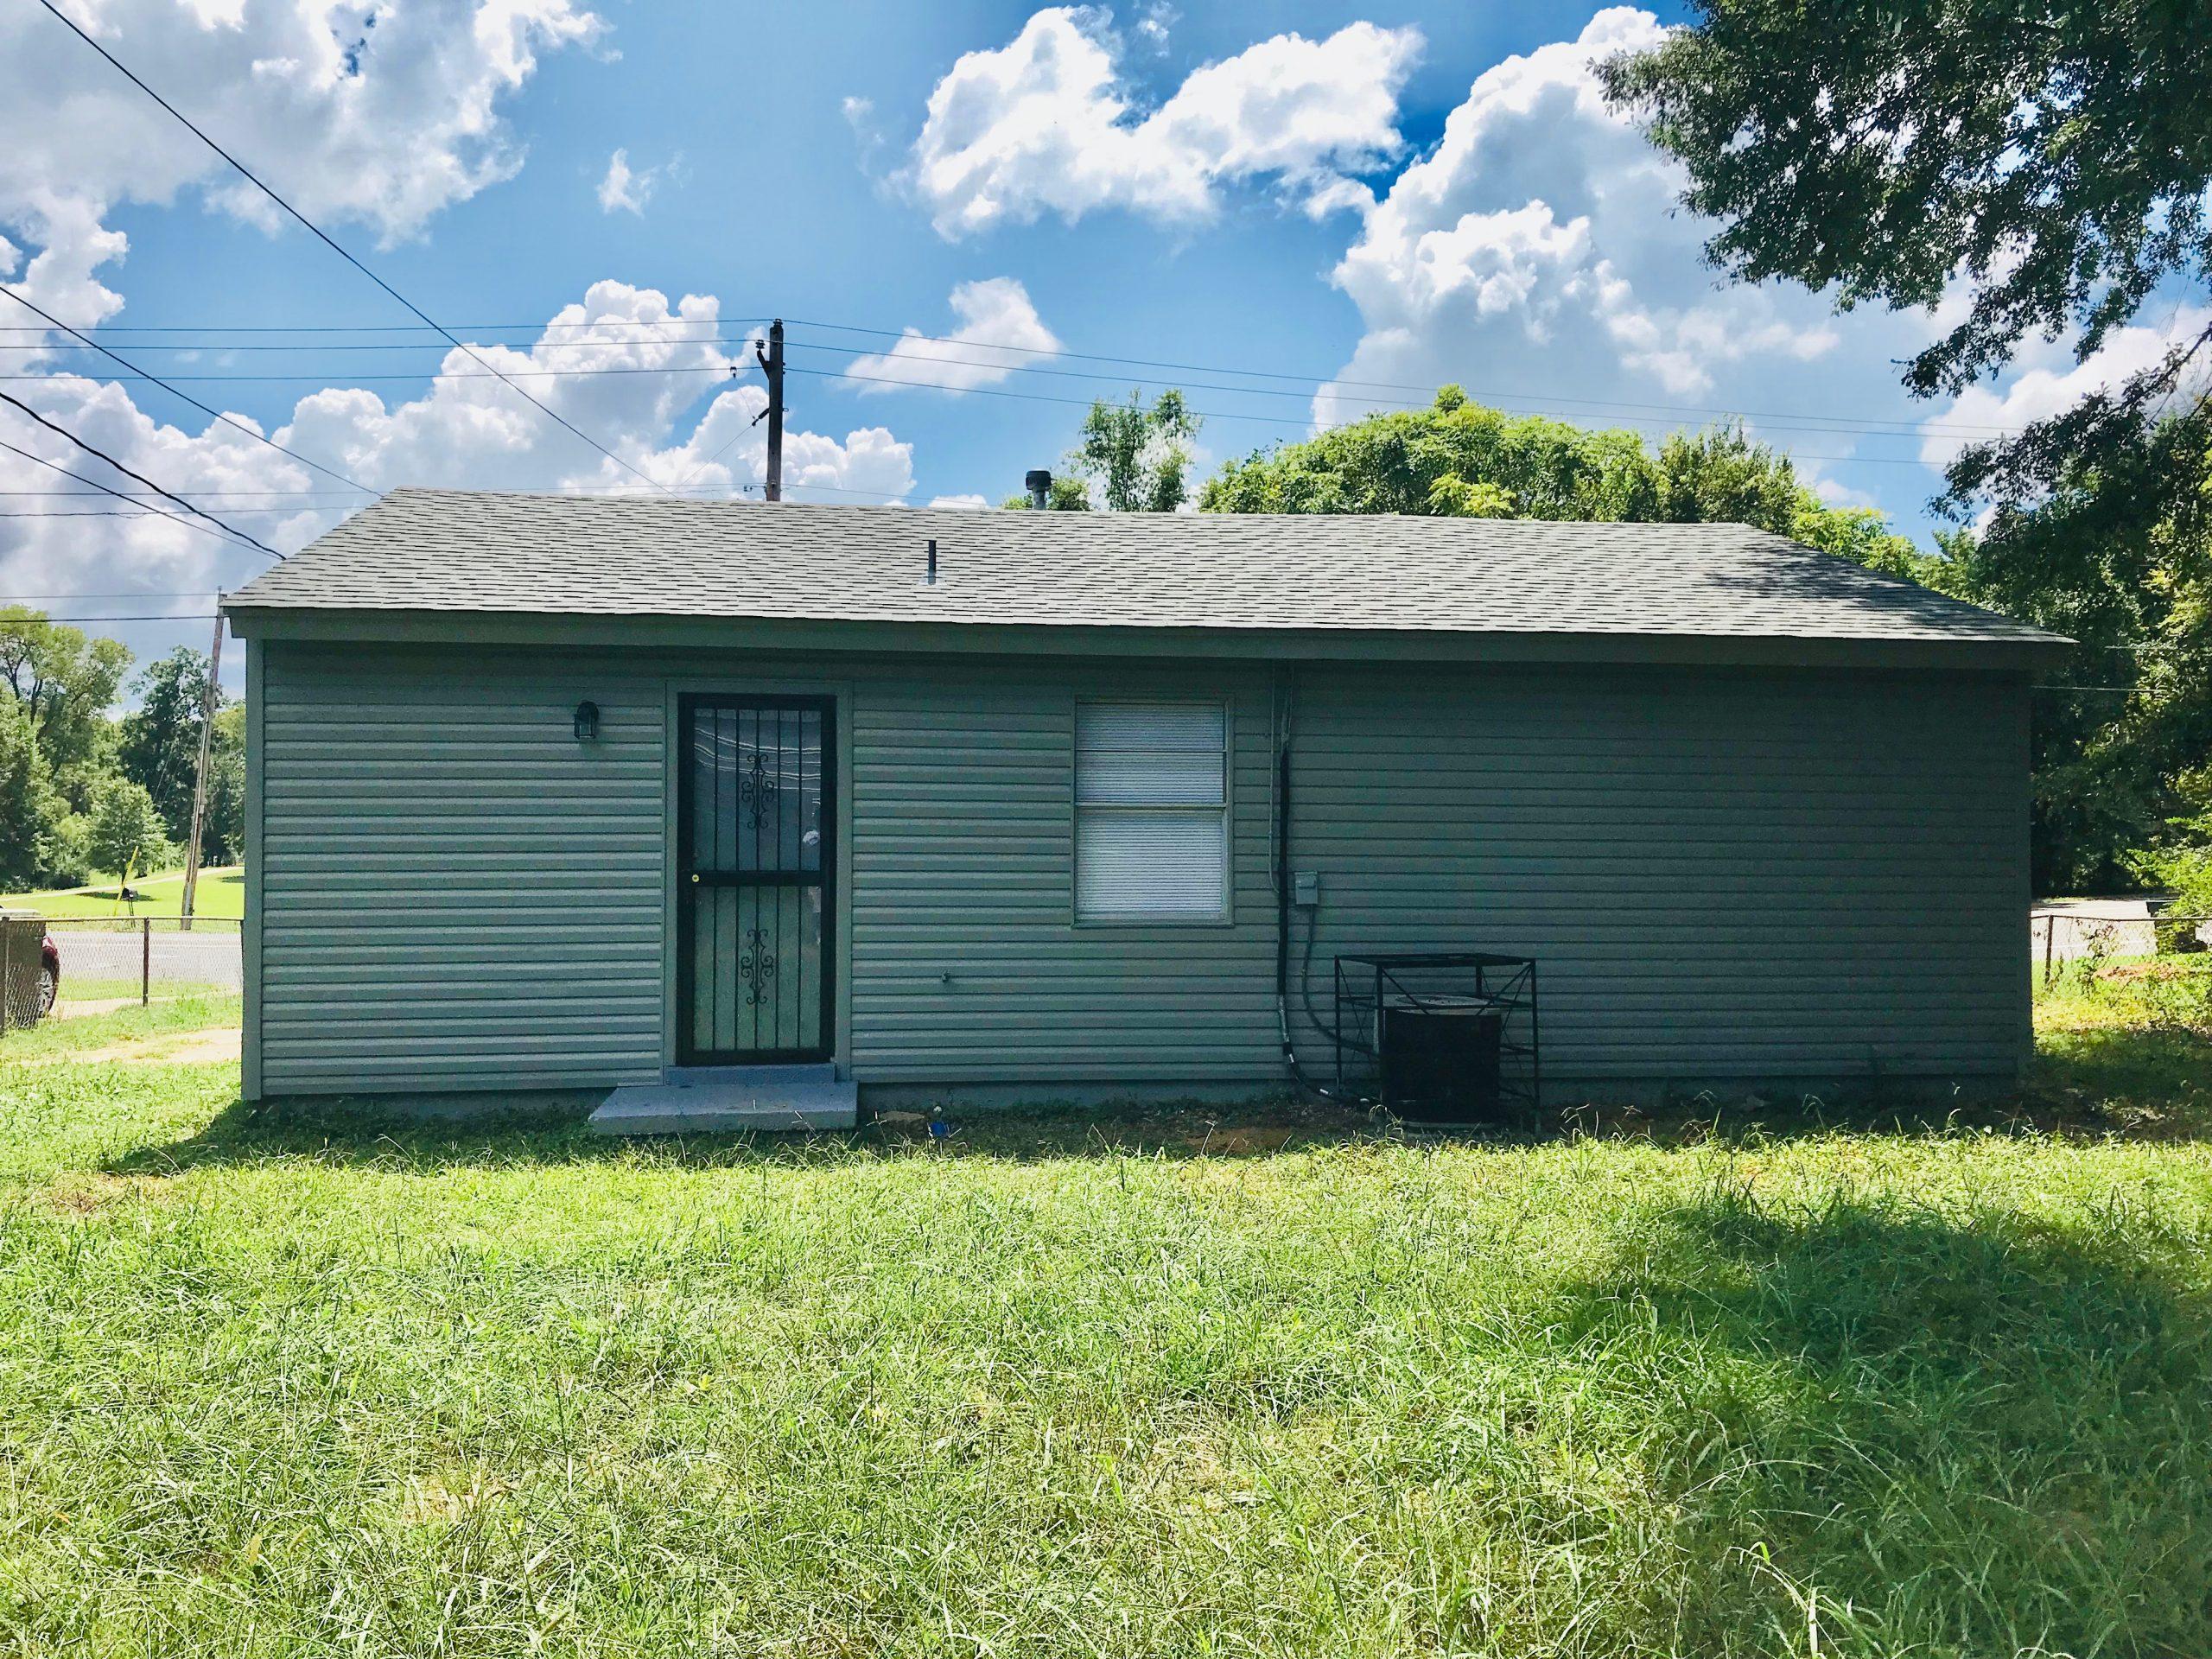 396 W Holmes Rd <br>Memphis, TN 38109